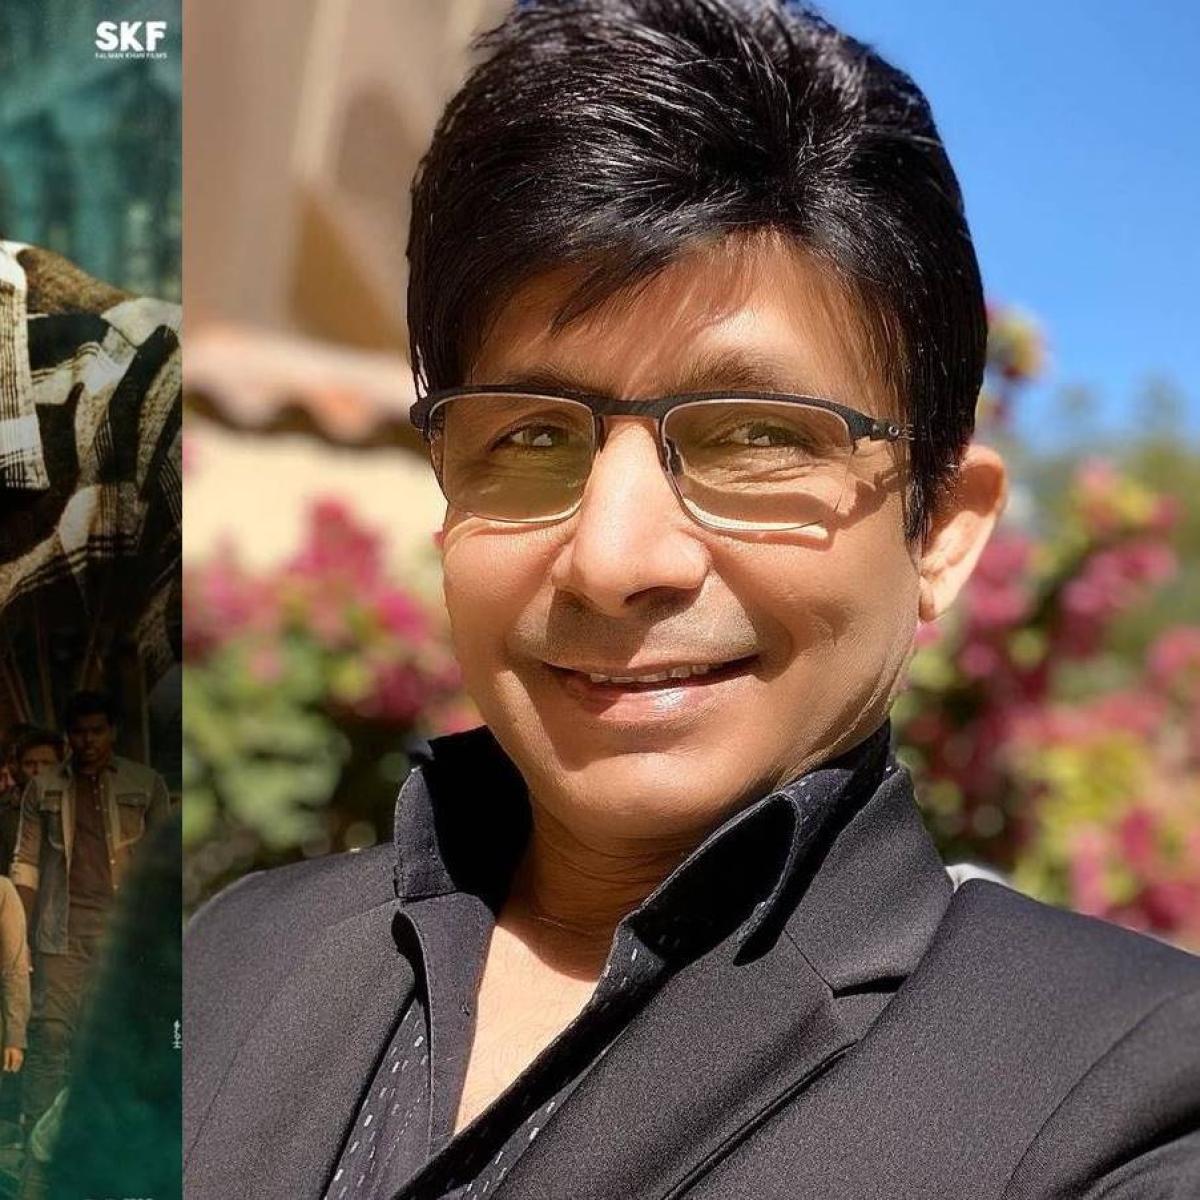 Salman Khan files defamation complaint against KRK over 'Radhe' review